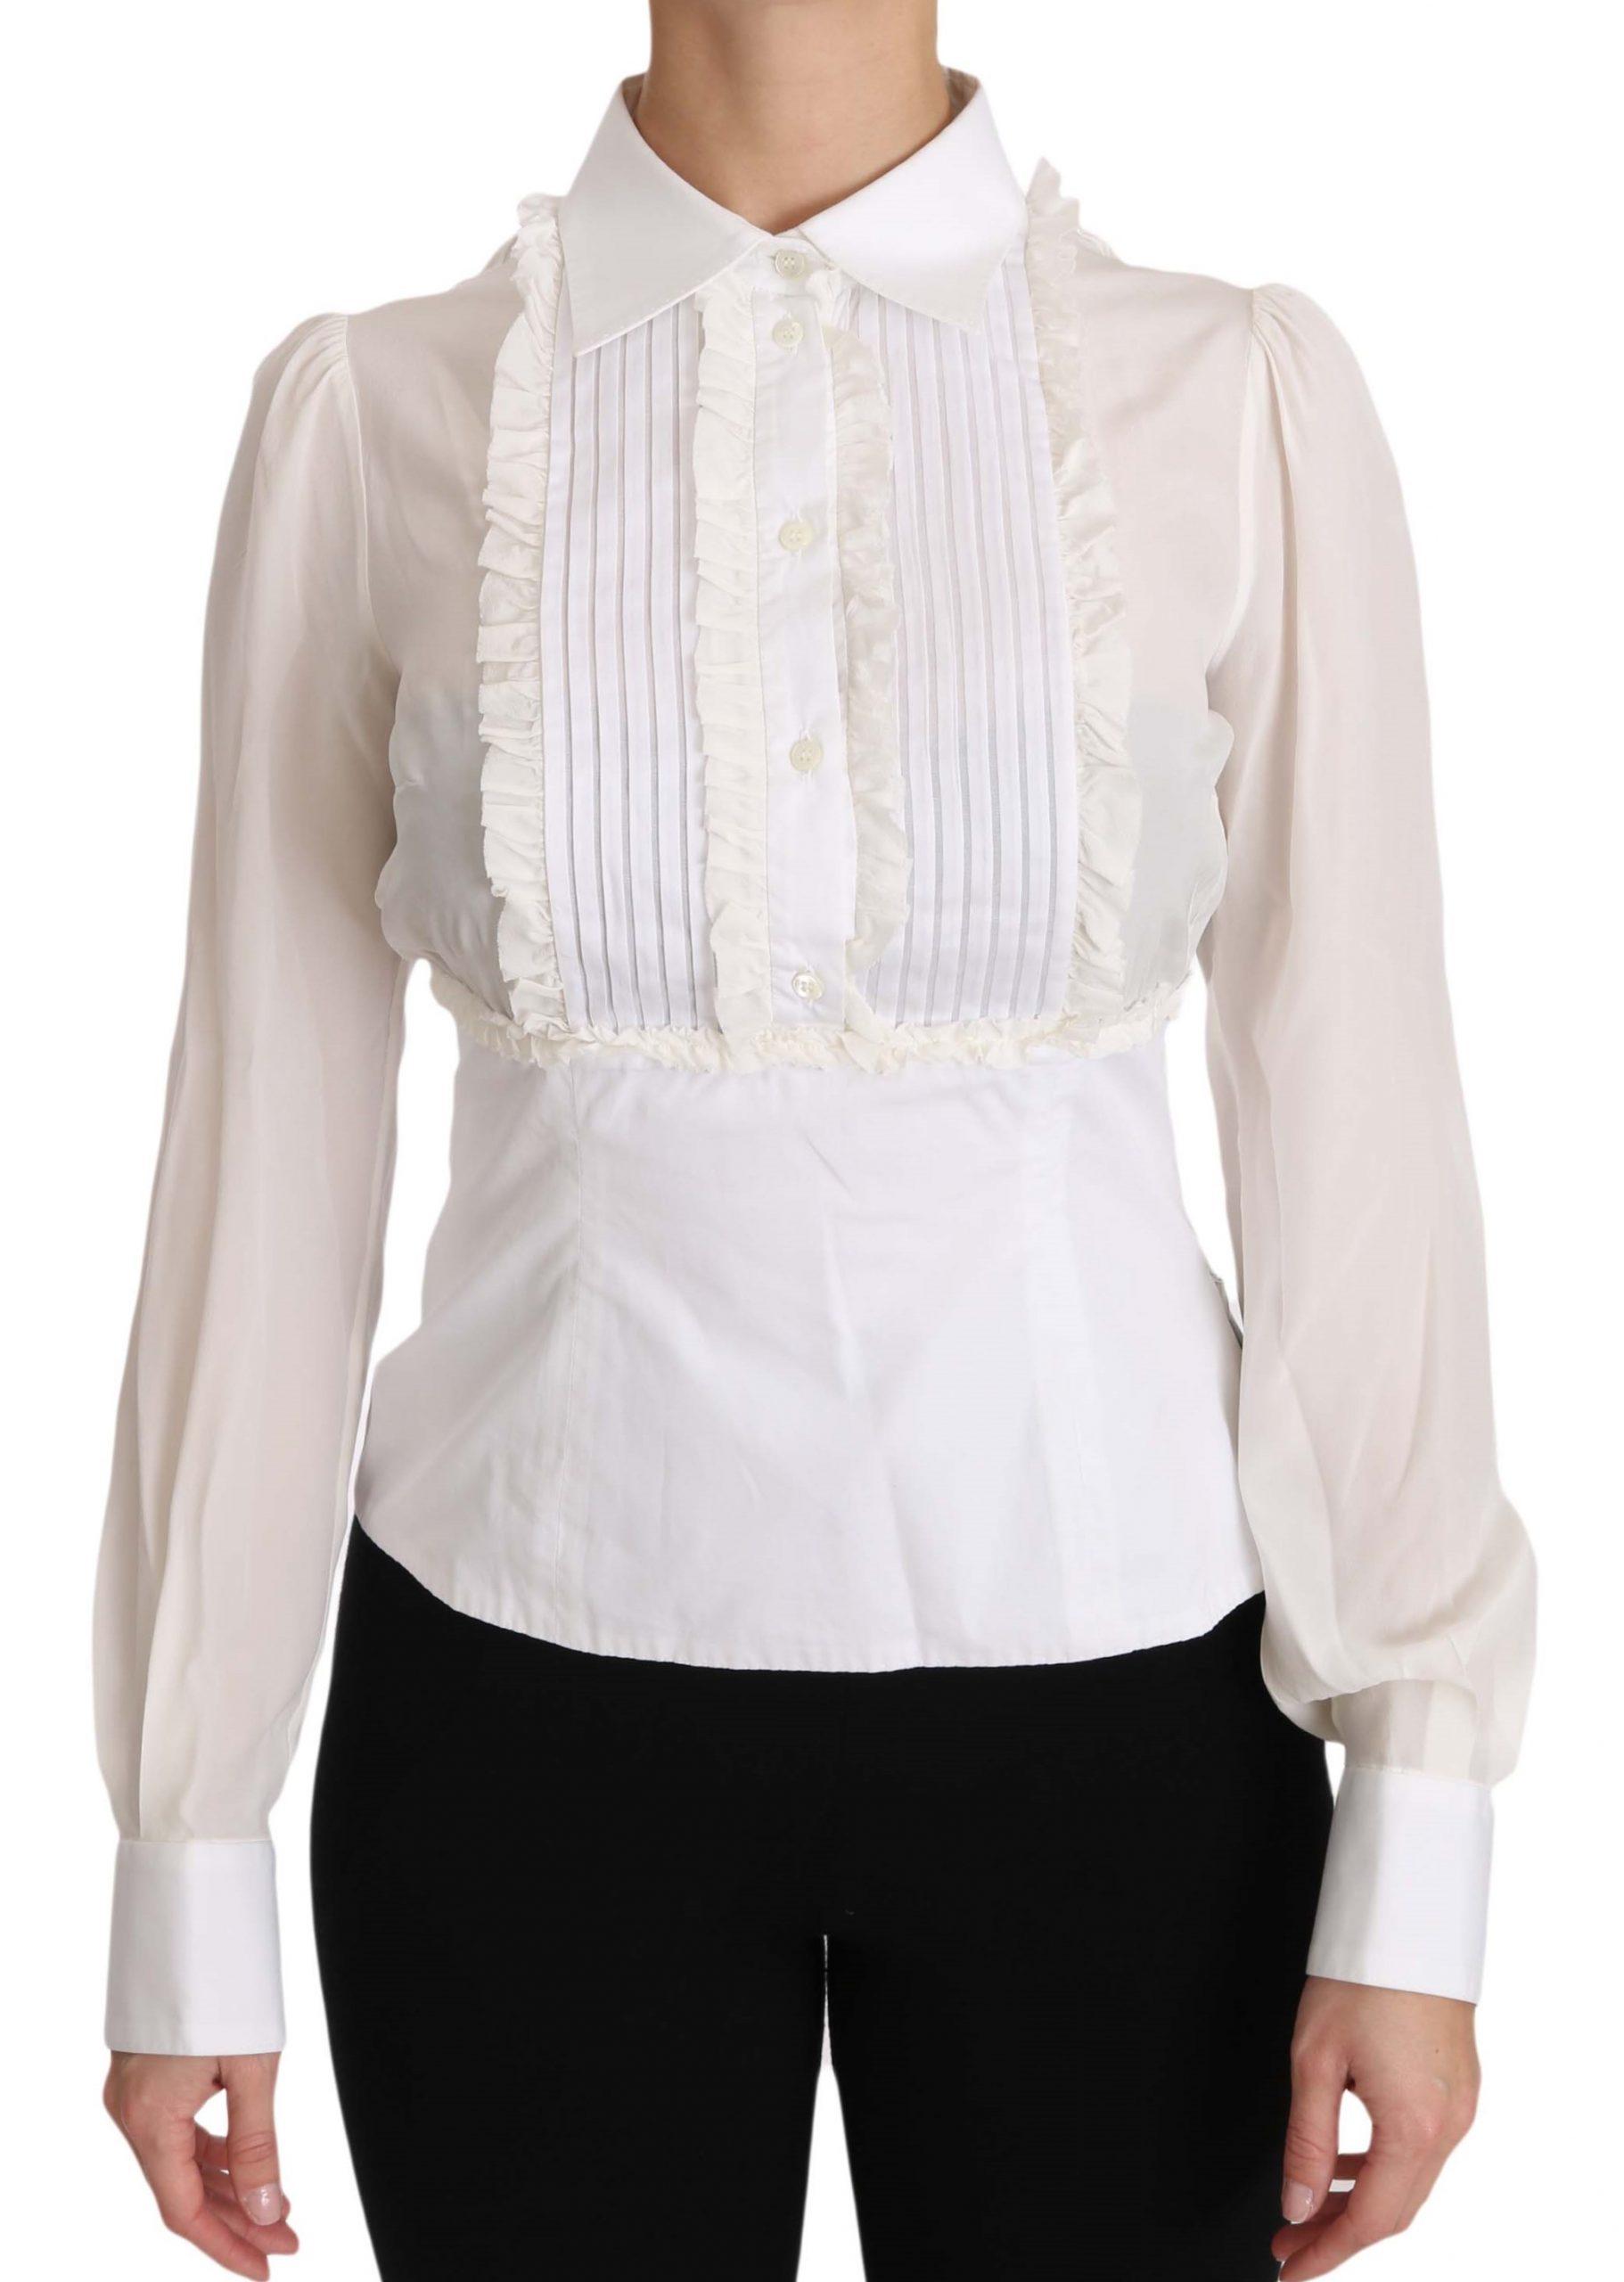 Dolce & Gabbana Women's Ruffle Longsleeved Shirt White TSH3177 - IT42|M